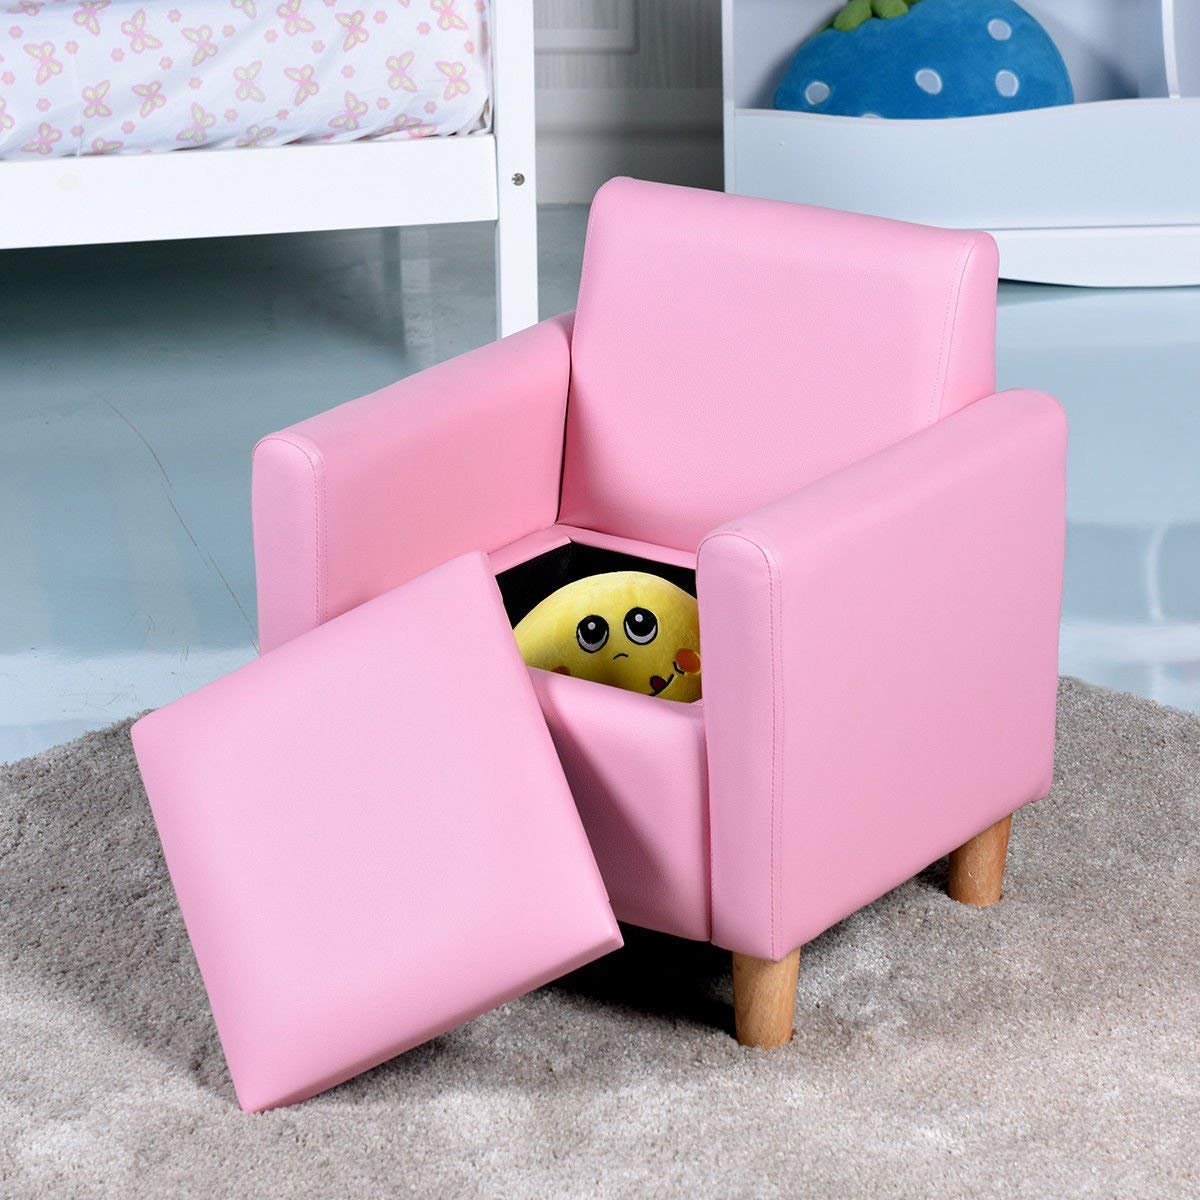 HONEY JOY Kids Sofa, Upholstered Armrest, Sturdy Wood Construction, Toddler Couch with Storage Box (Single Seat, Pink) by HONEY JOY (Image #7)